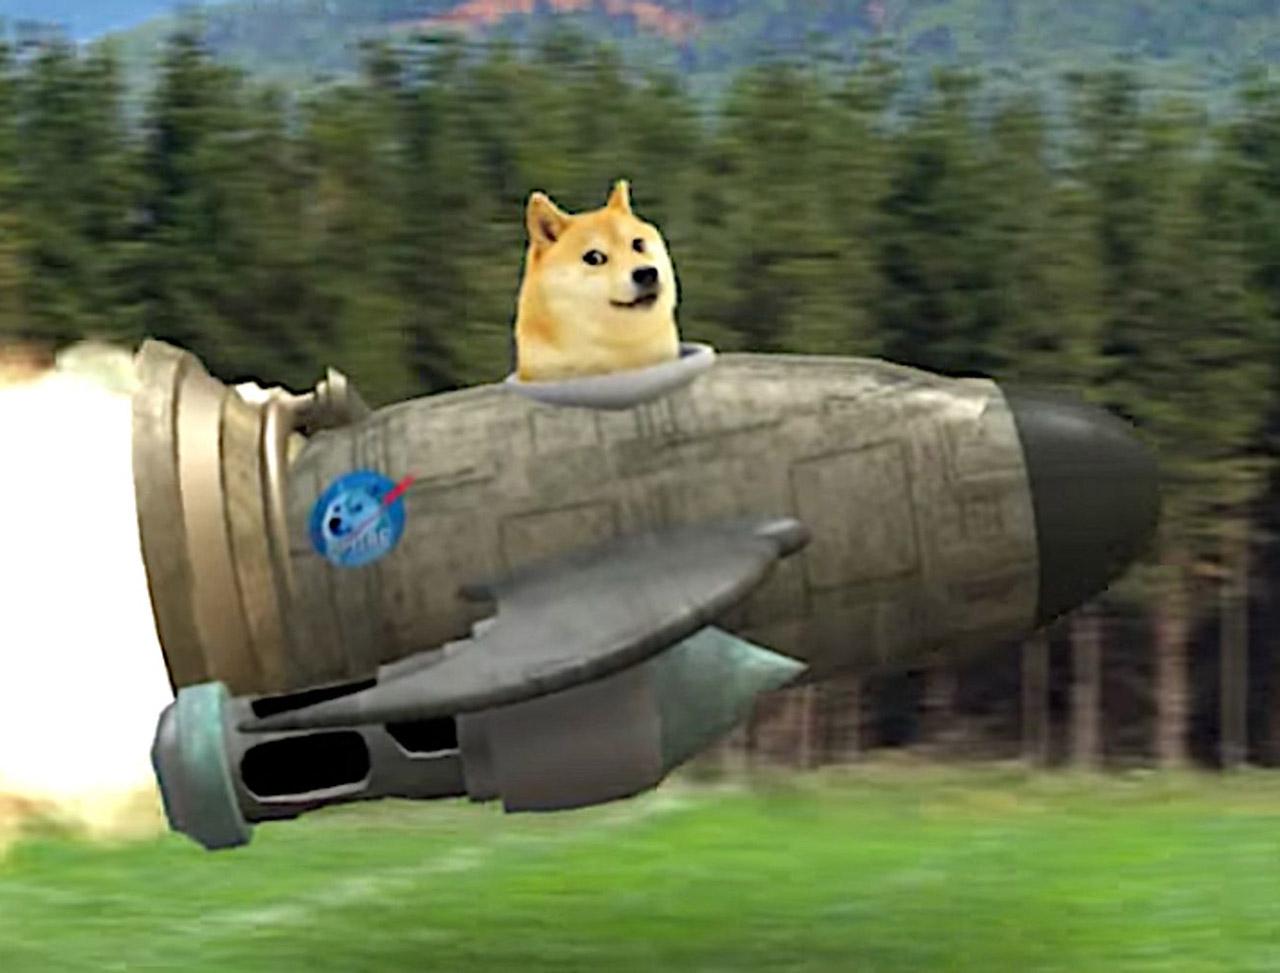 Elon Musk Dogecoin SpaceX DOGE-1 Moon